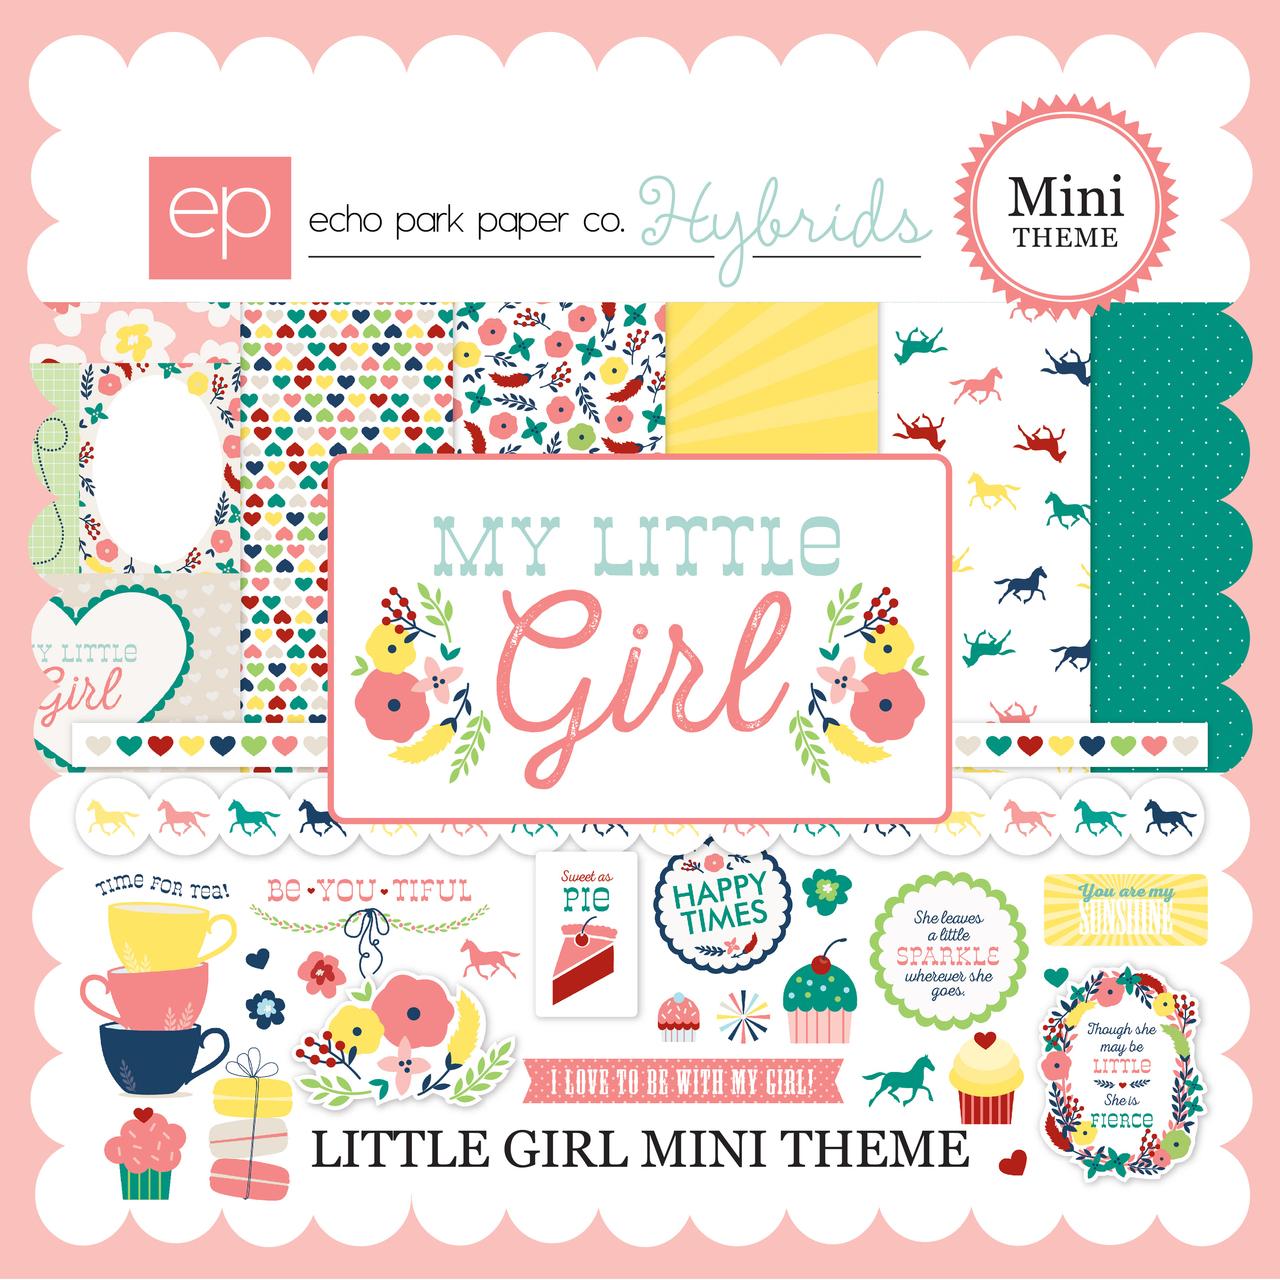 Little Girl Mini-Theme